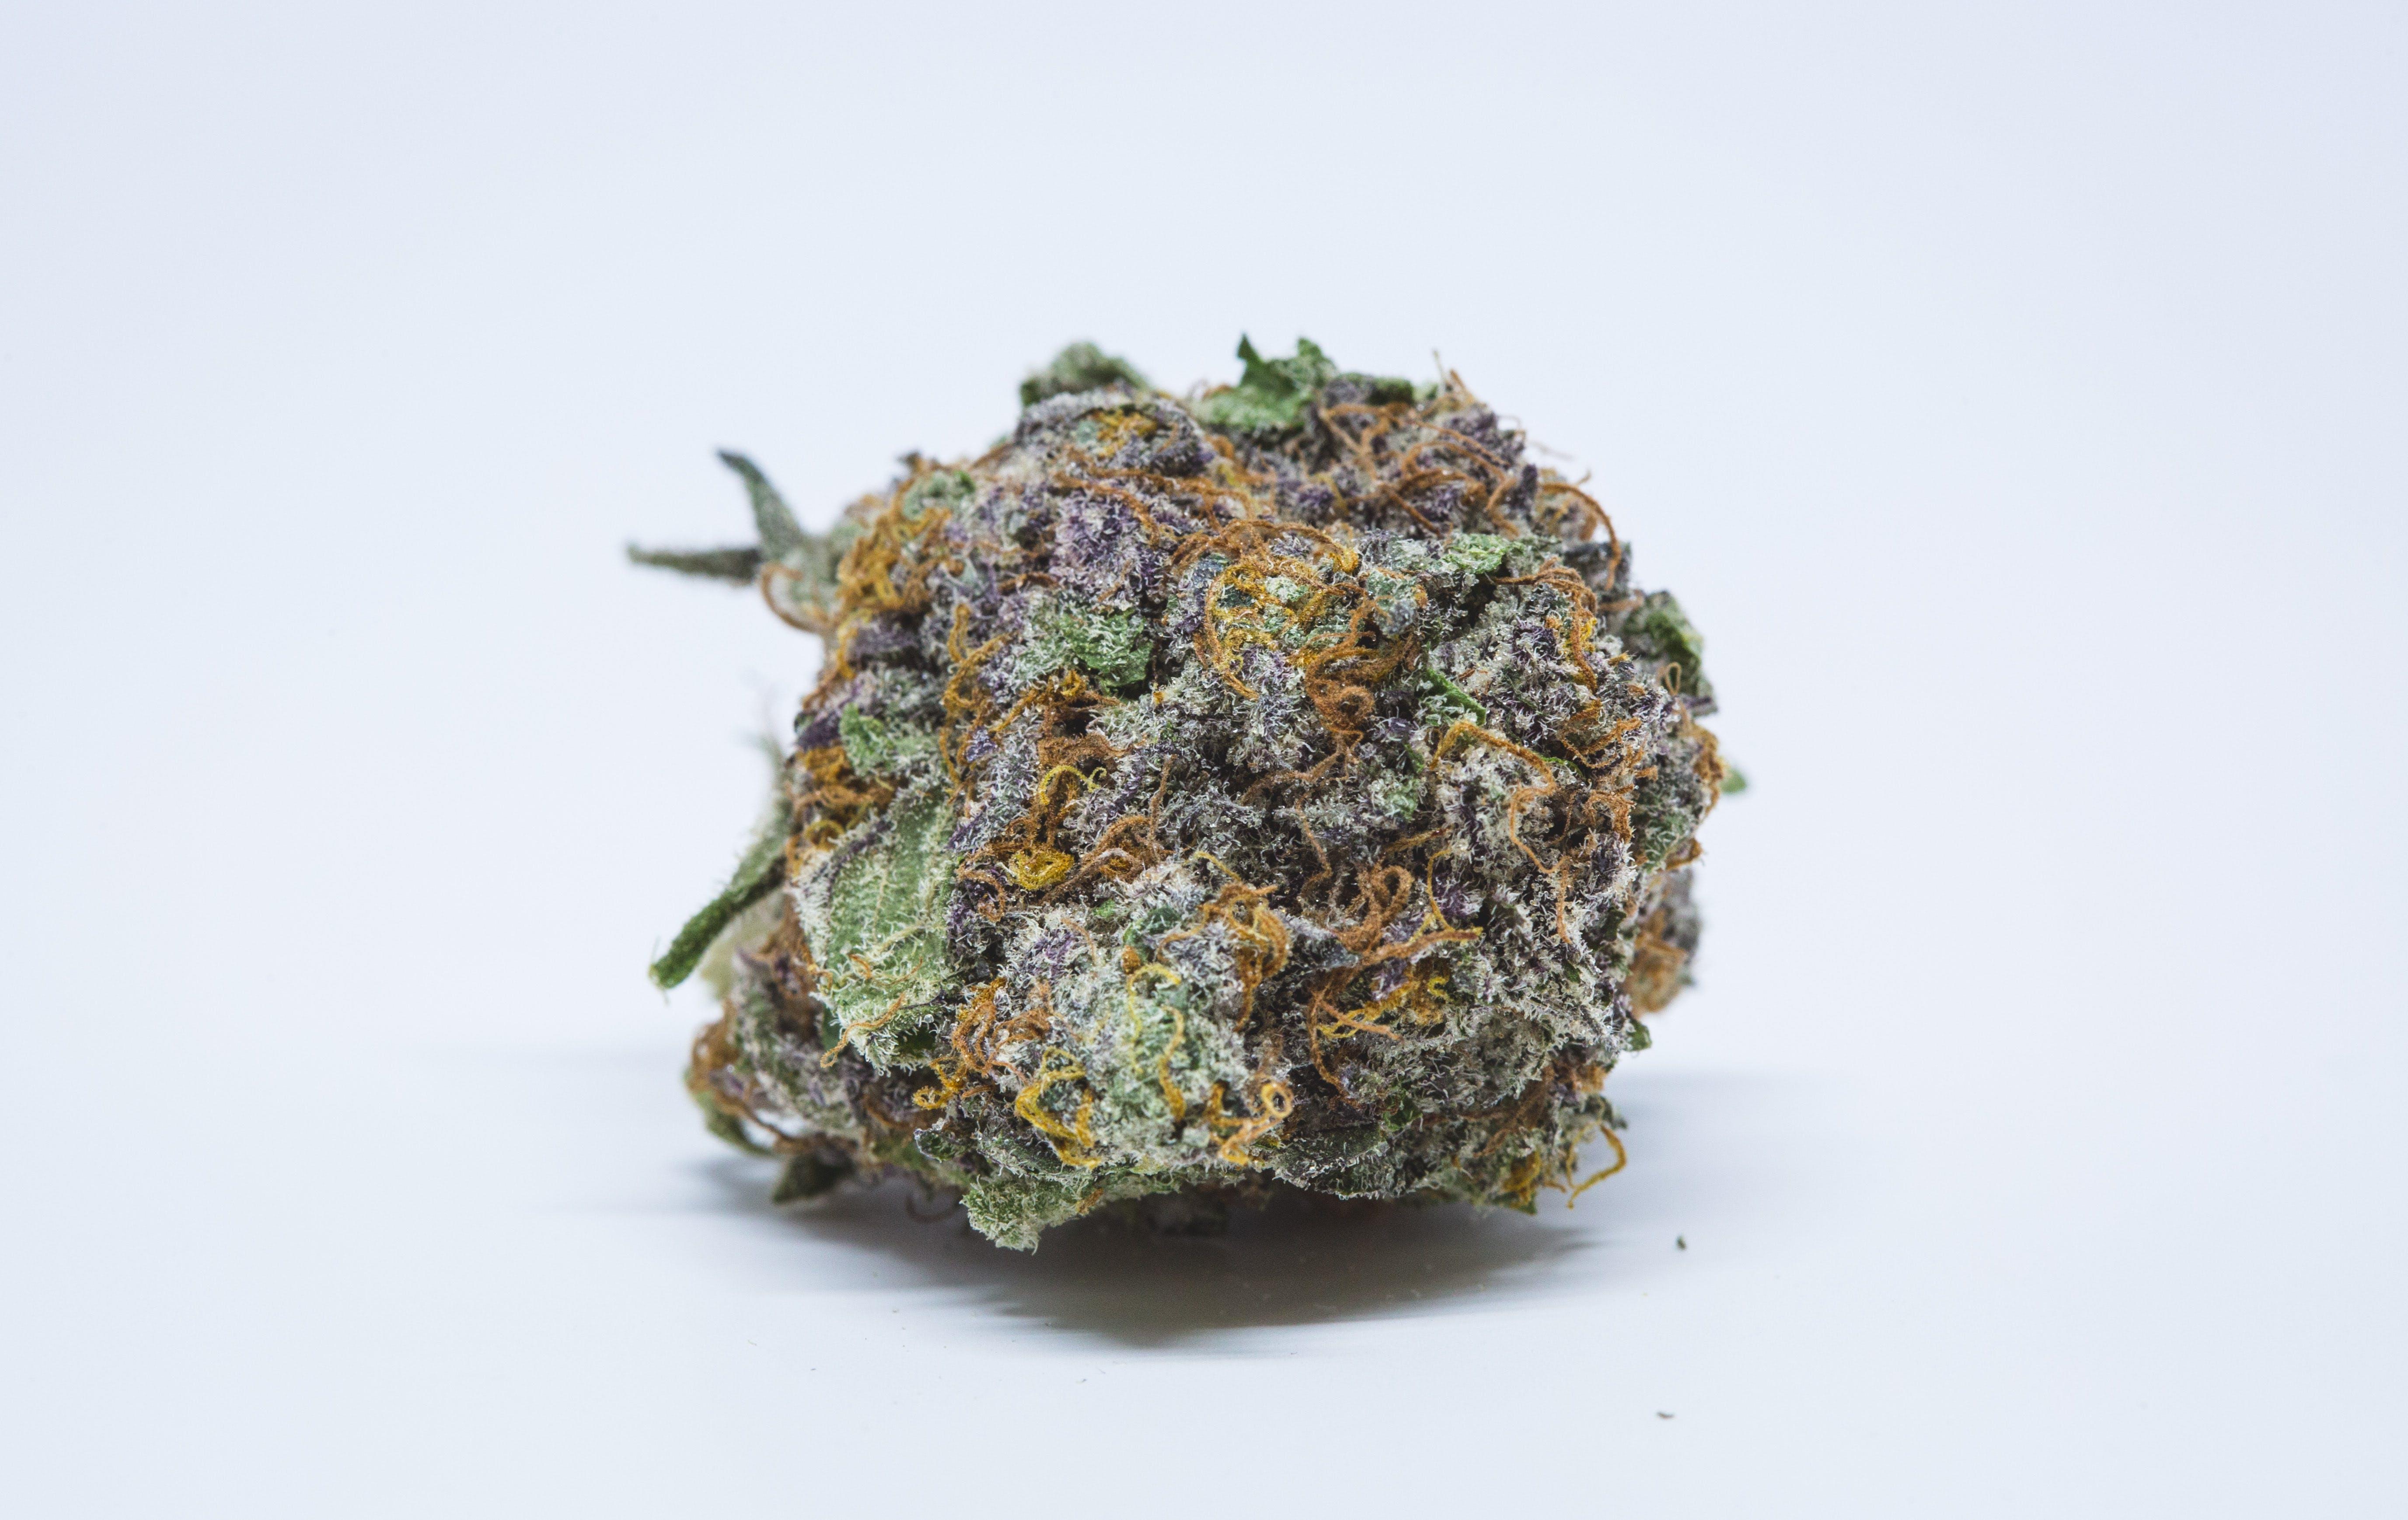 Purple OG Kush Weed; Purple OG Kush Cannabis Strain; Purple OG Kush Hybrid Marijuana Strain